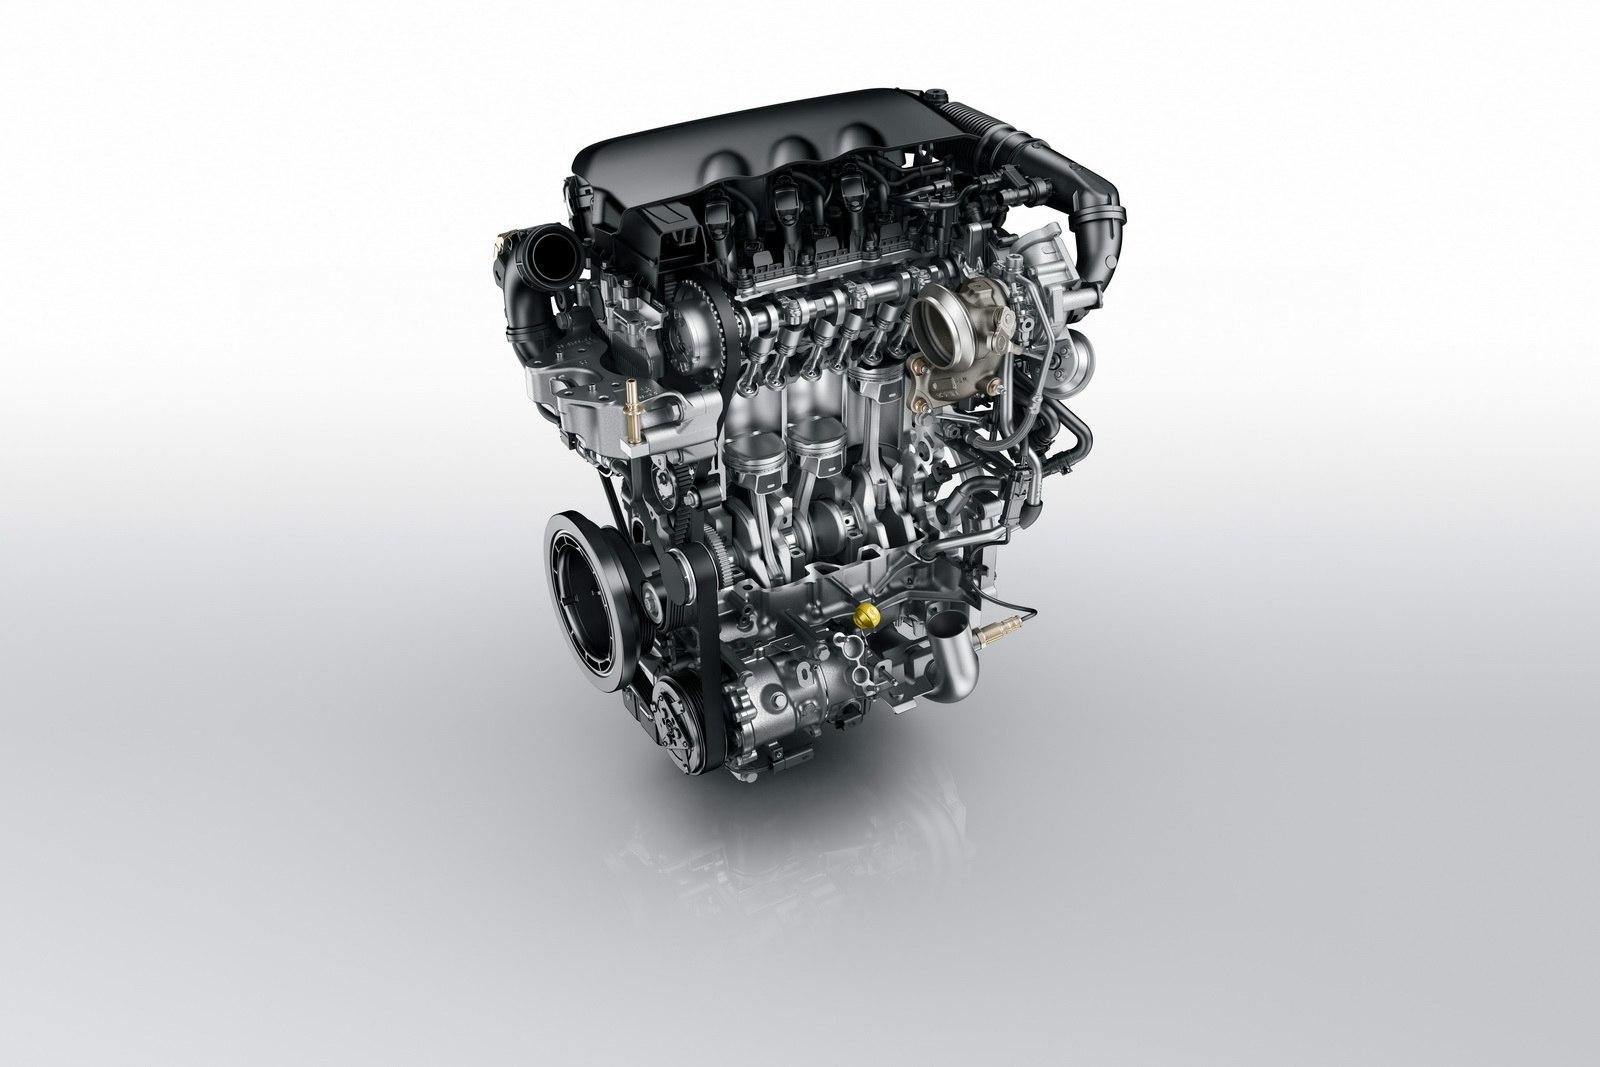 Peugeot-Engines-1